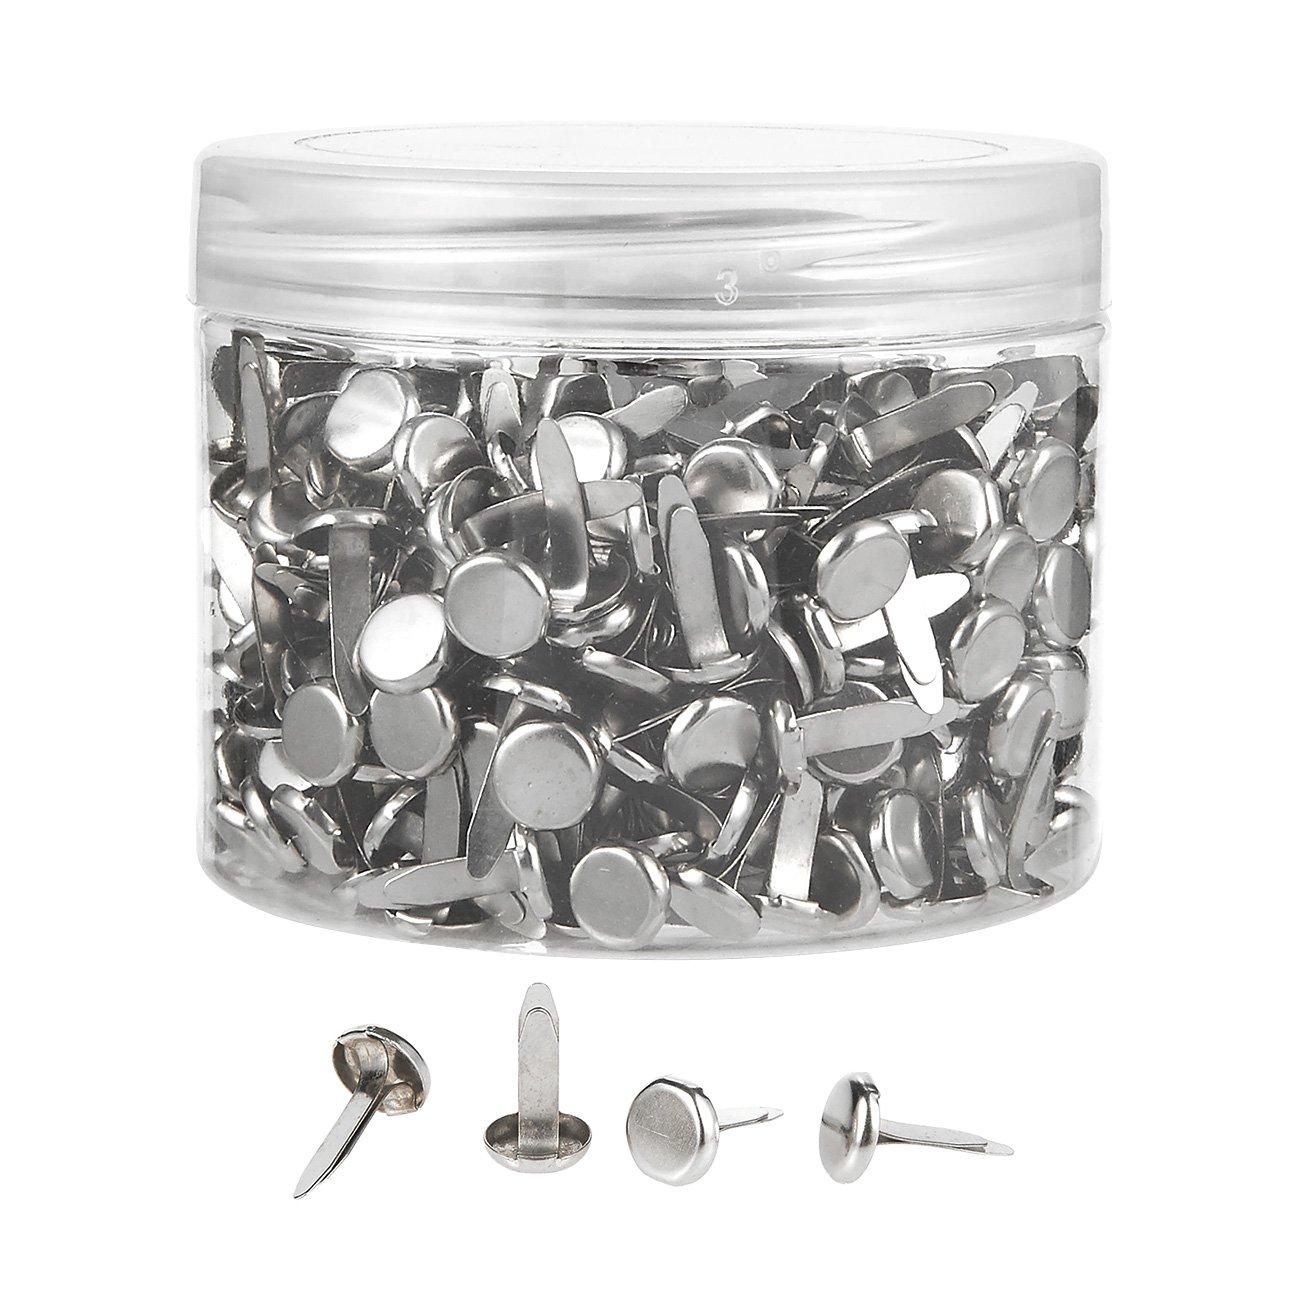 500 Pieces Mini Brads - Scrapbooking Brads - Paper Fasteners - Iron Brad Fasteners, Silver Color